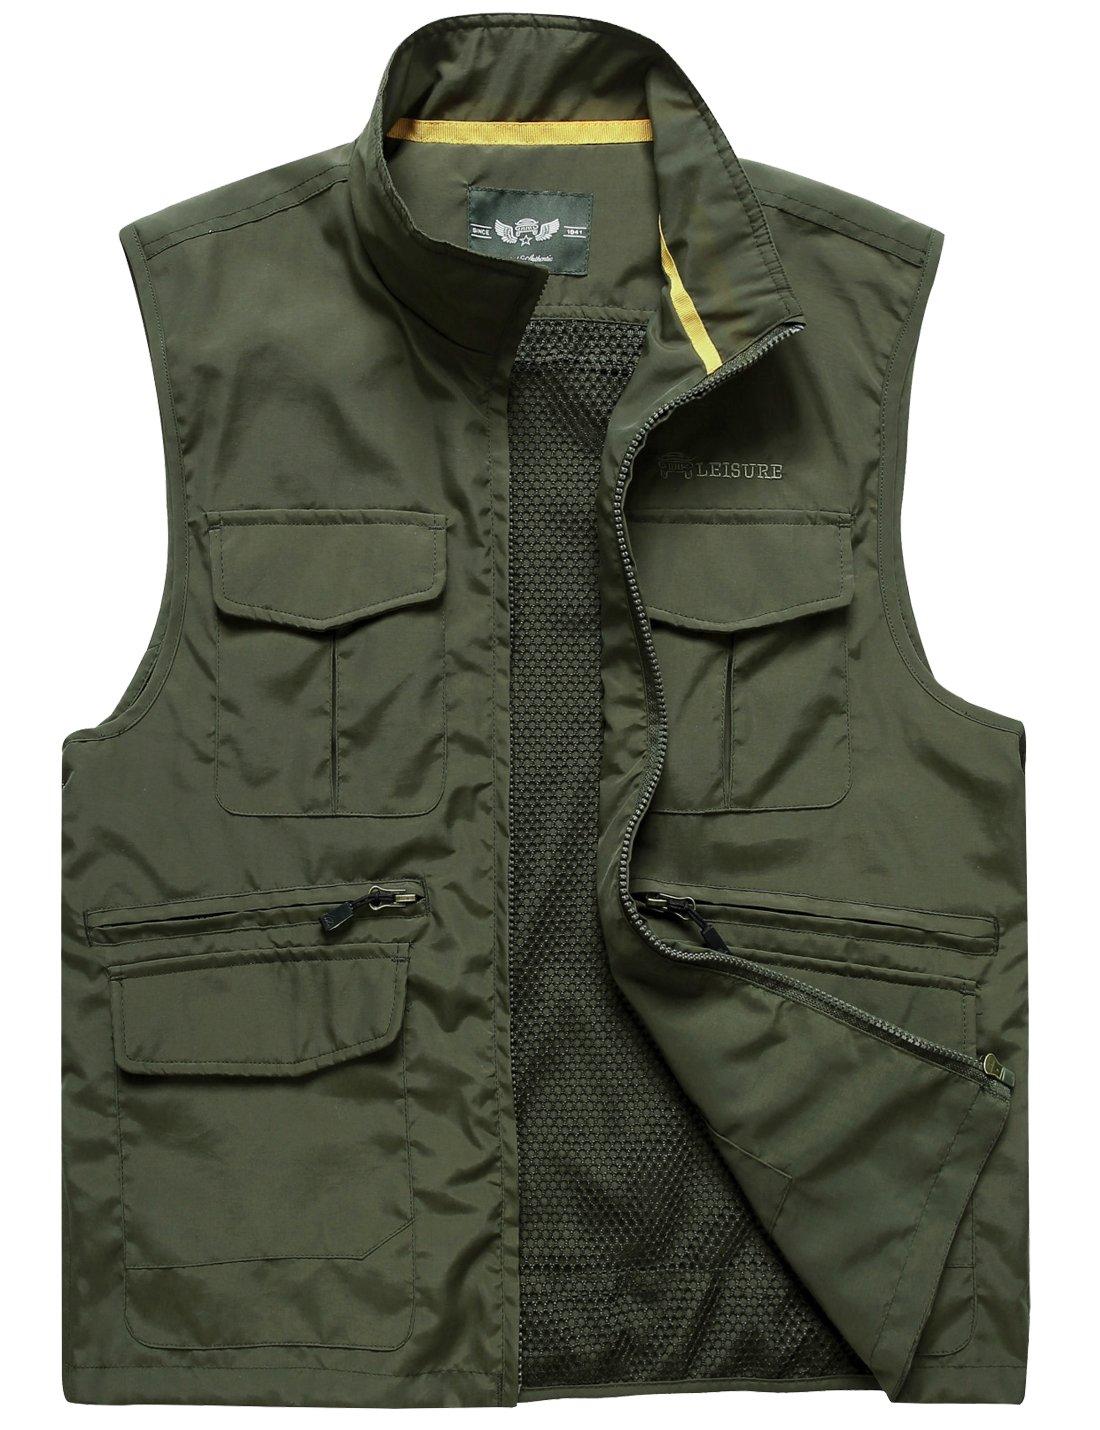 Flygo Men's Leisure Mutiple Pockets Outdoors Vest Sleeveless Jacket (Large, Army Green) by Flygo